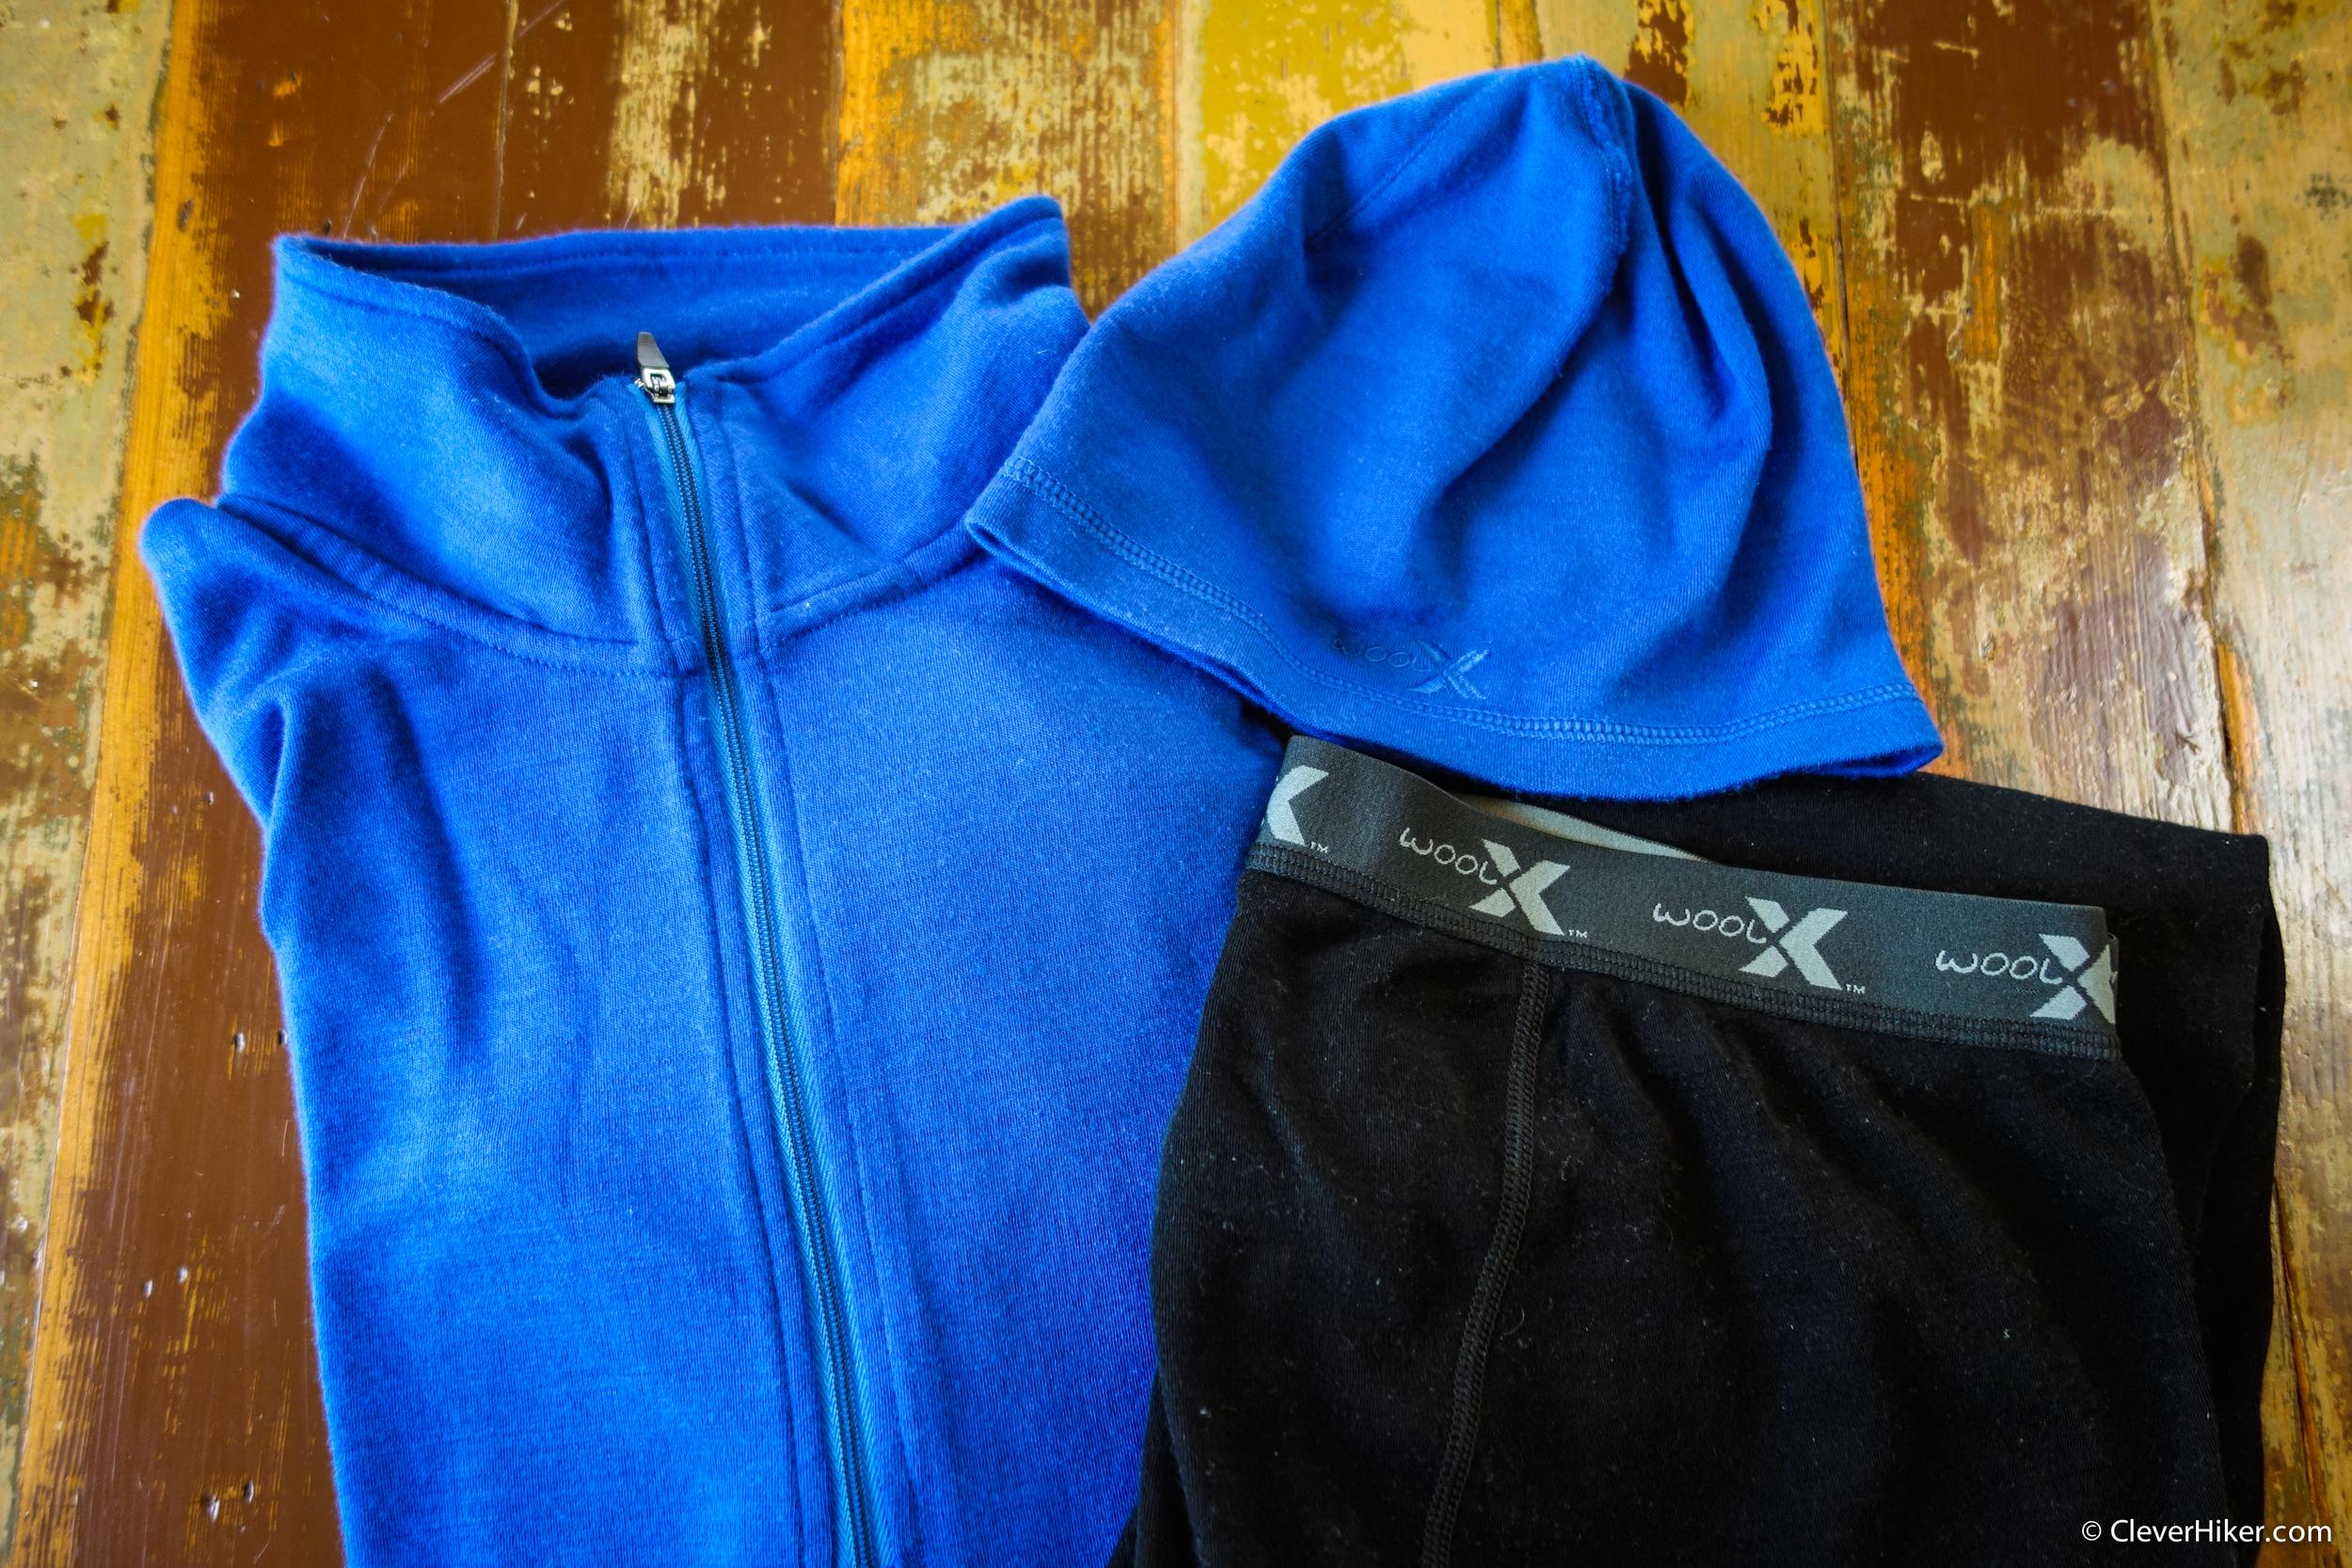 woolx clothing